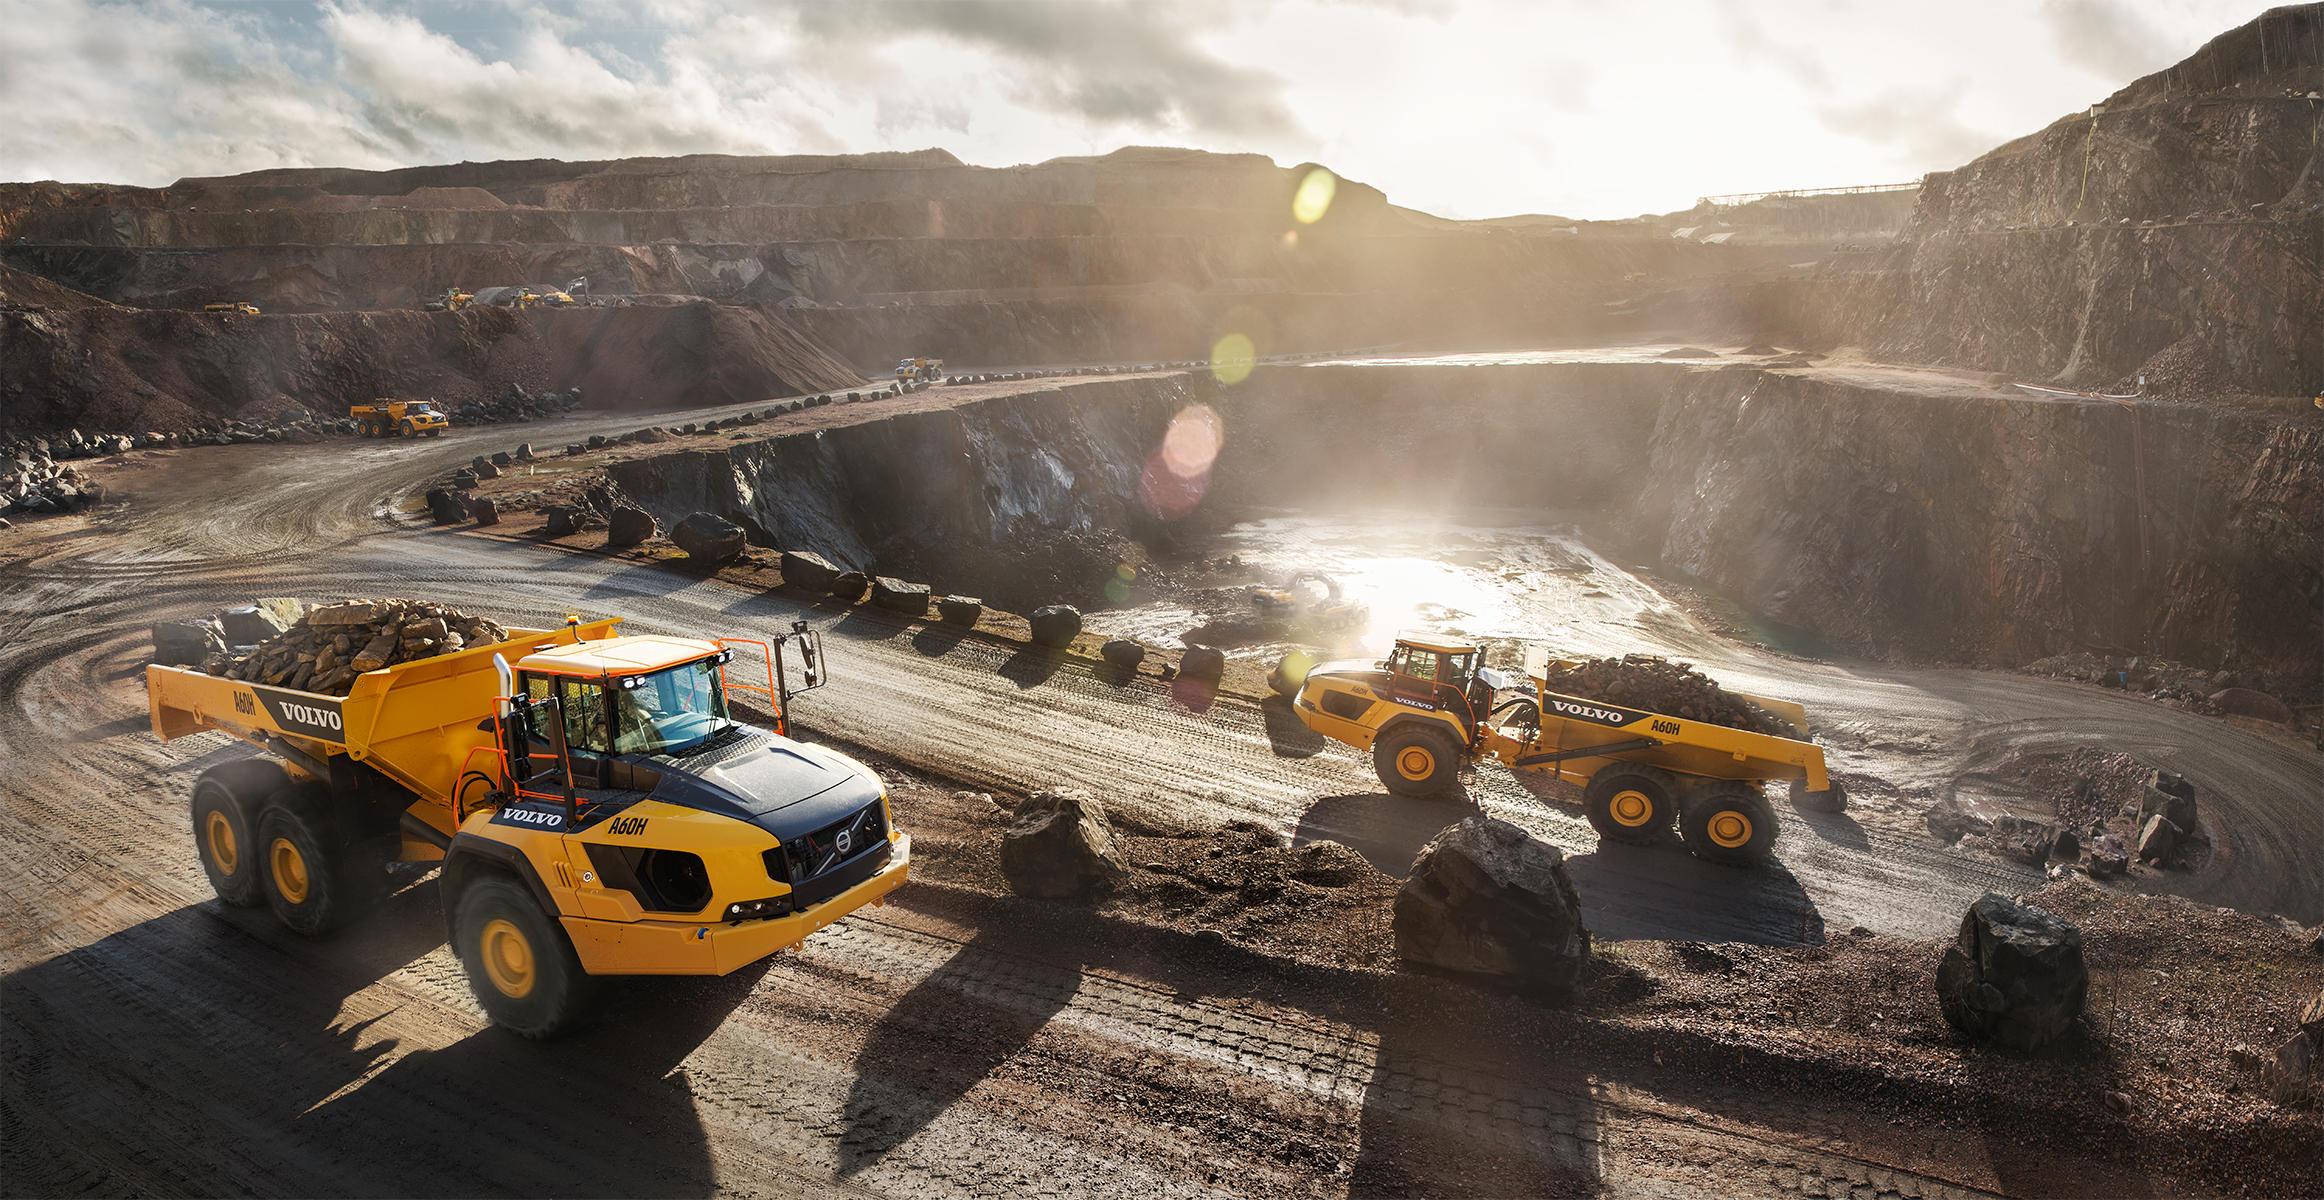 pale grandi le ammiraglie Volvo-benefits-articulated-hauler-a60h-t4f-sv-profitability-2324x1200